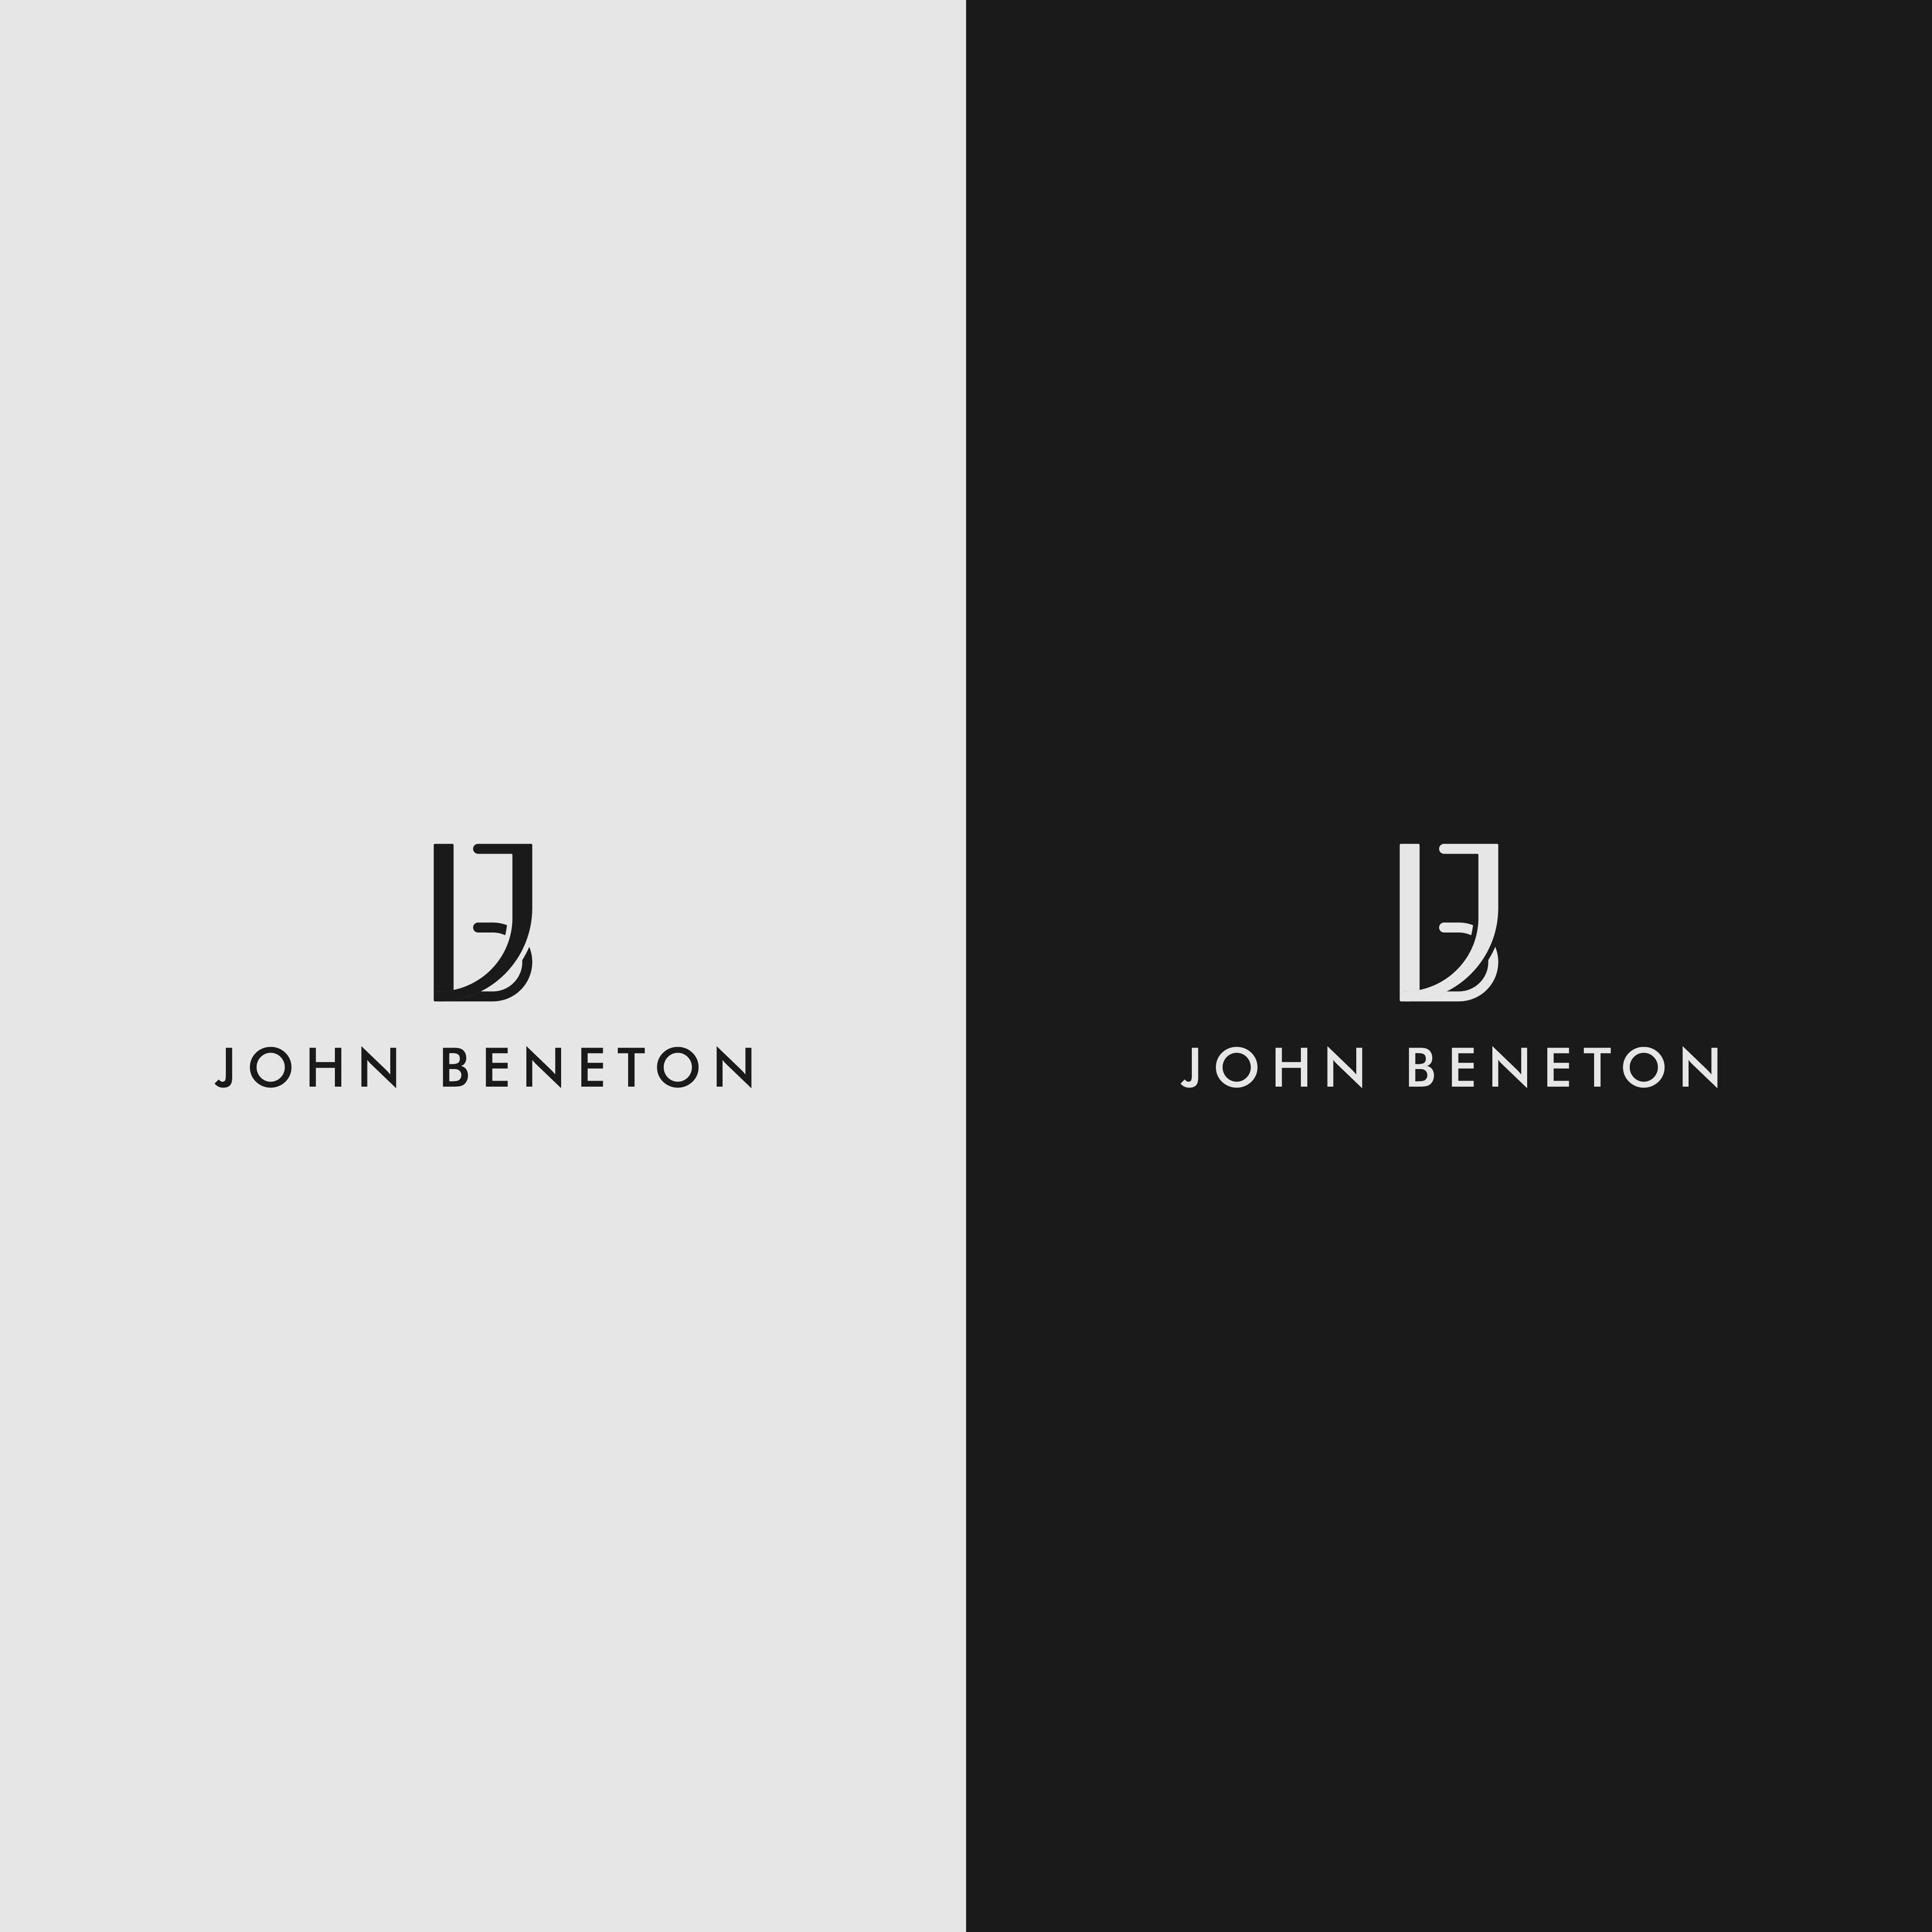 Winning Entry #81 for Logo Design contest - John beneton jewelry looking for identification - original